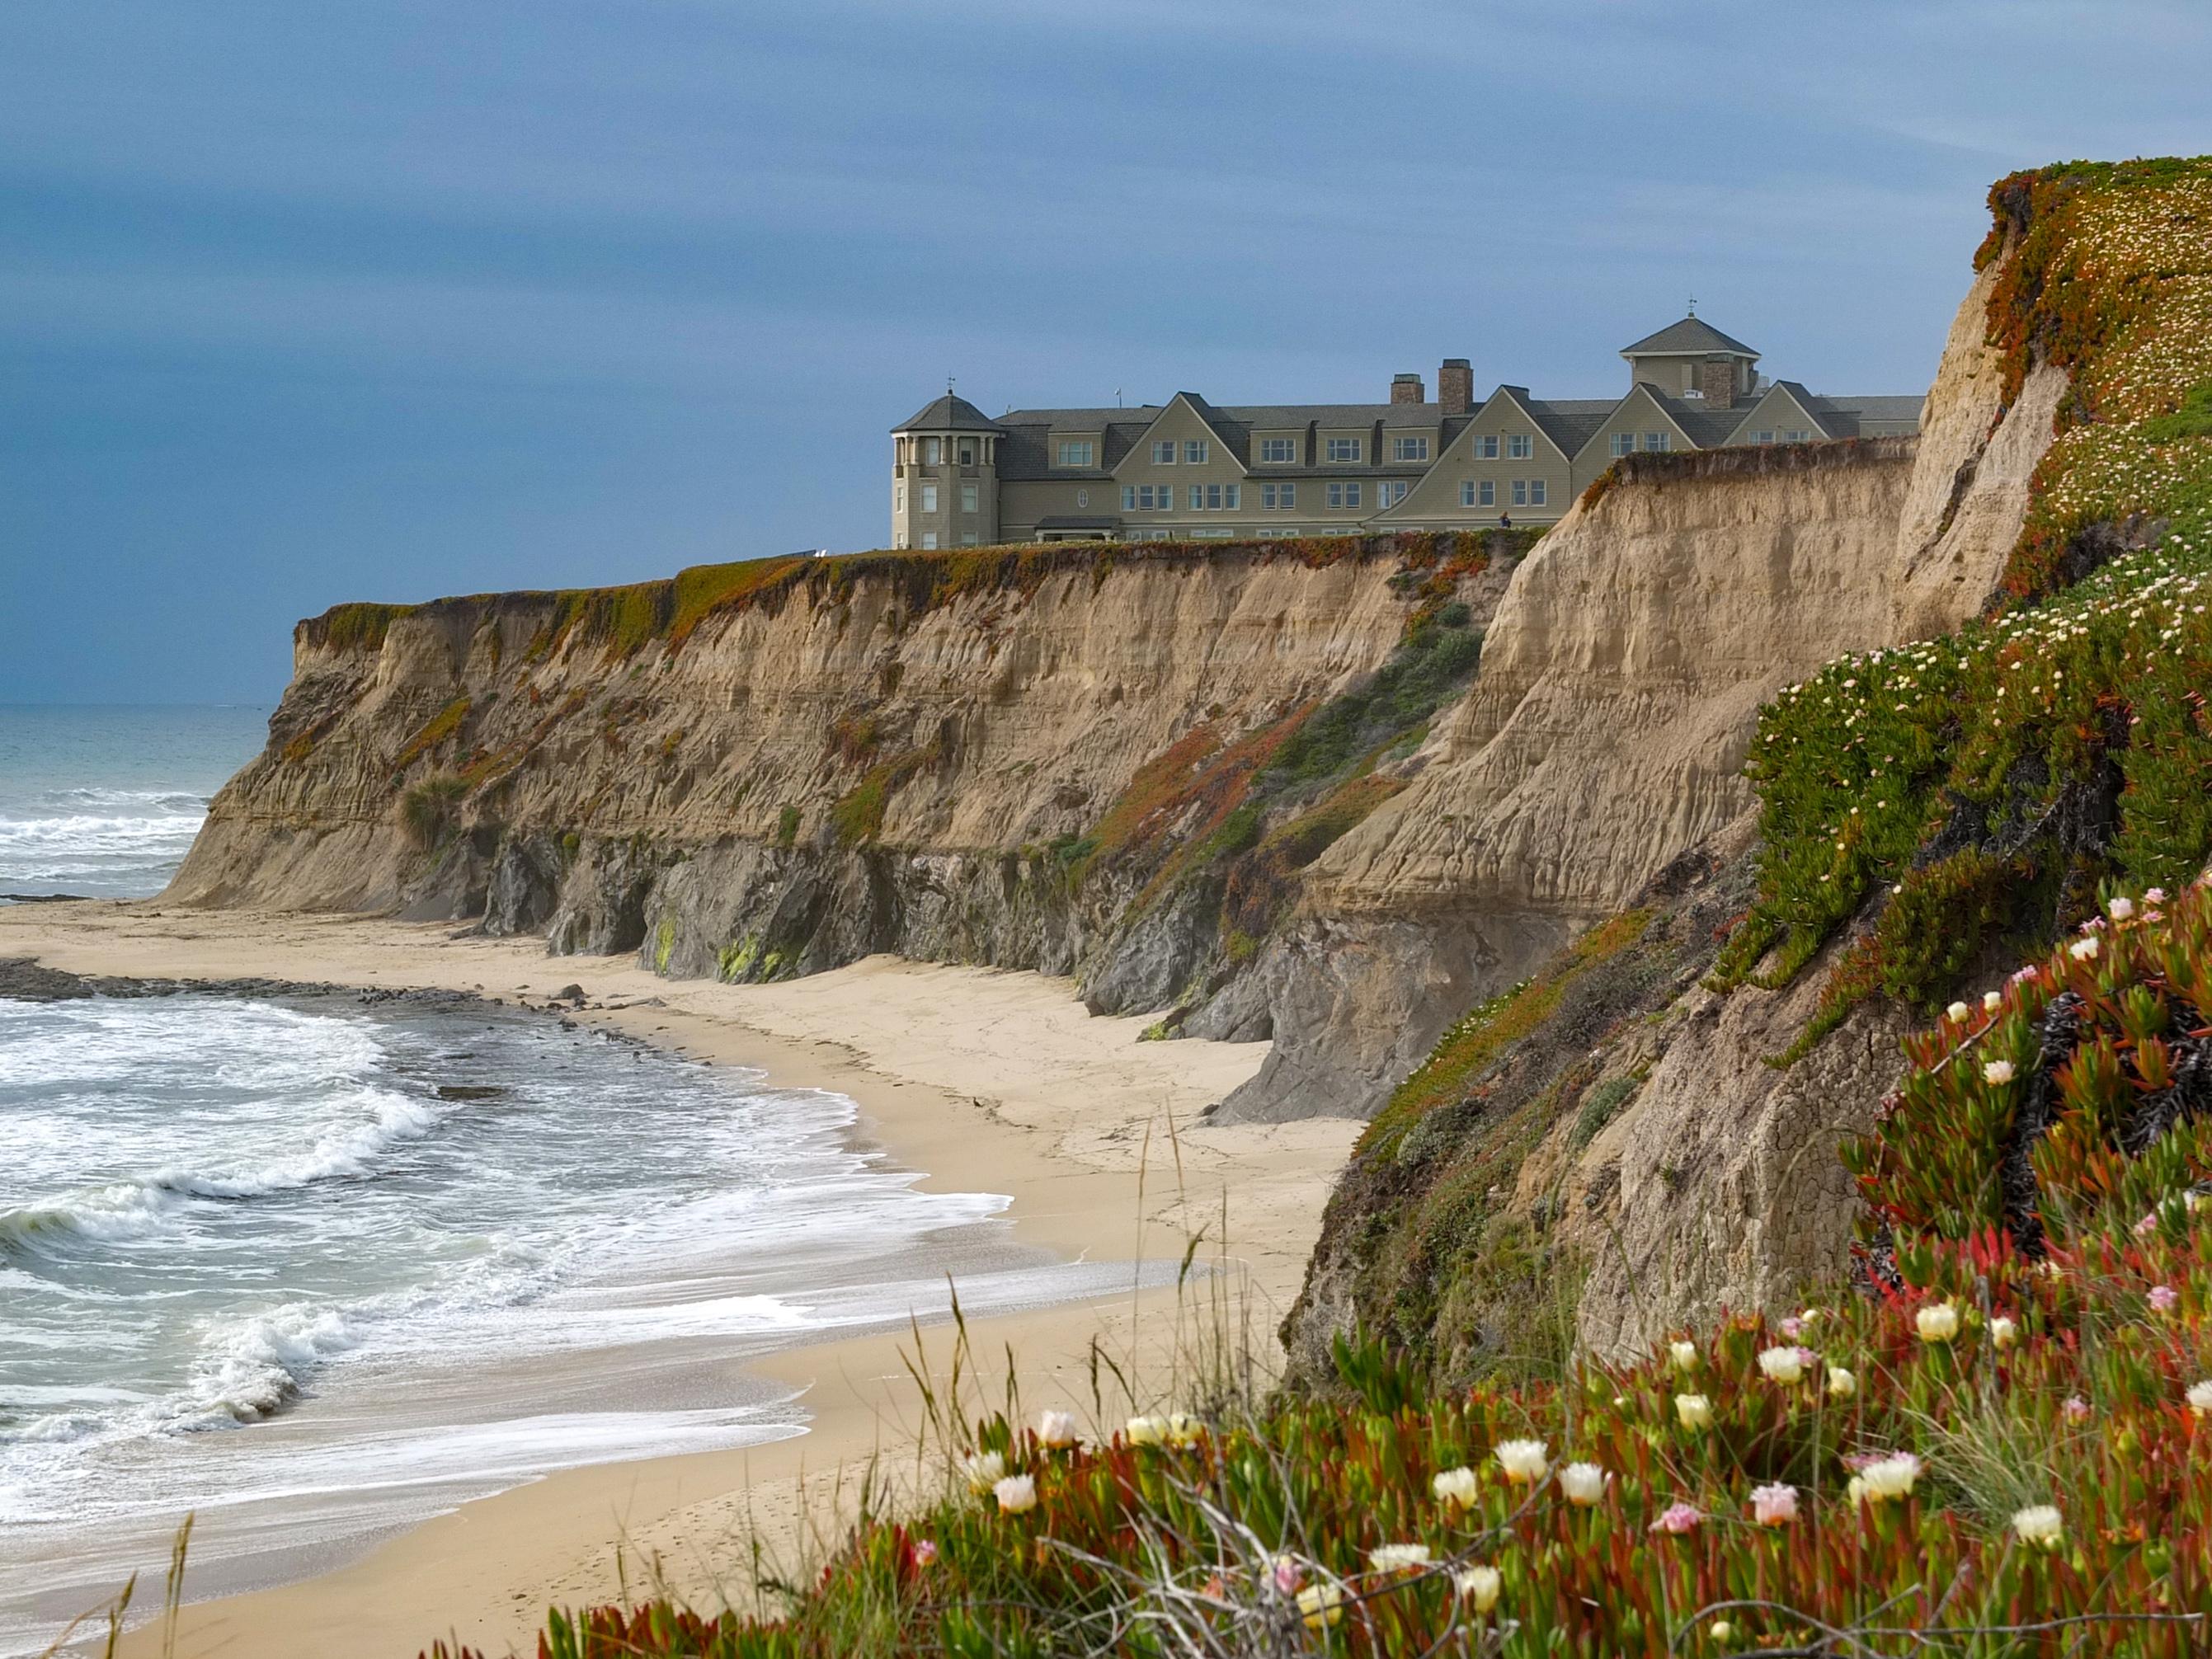 File Norcal2018 Beach And Cliff At Ritz Carlton Half Moon Bay S0675078 Jpg